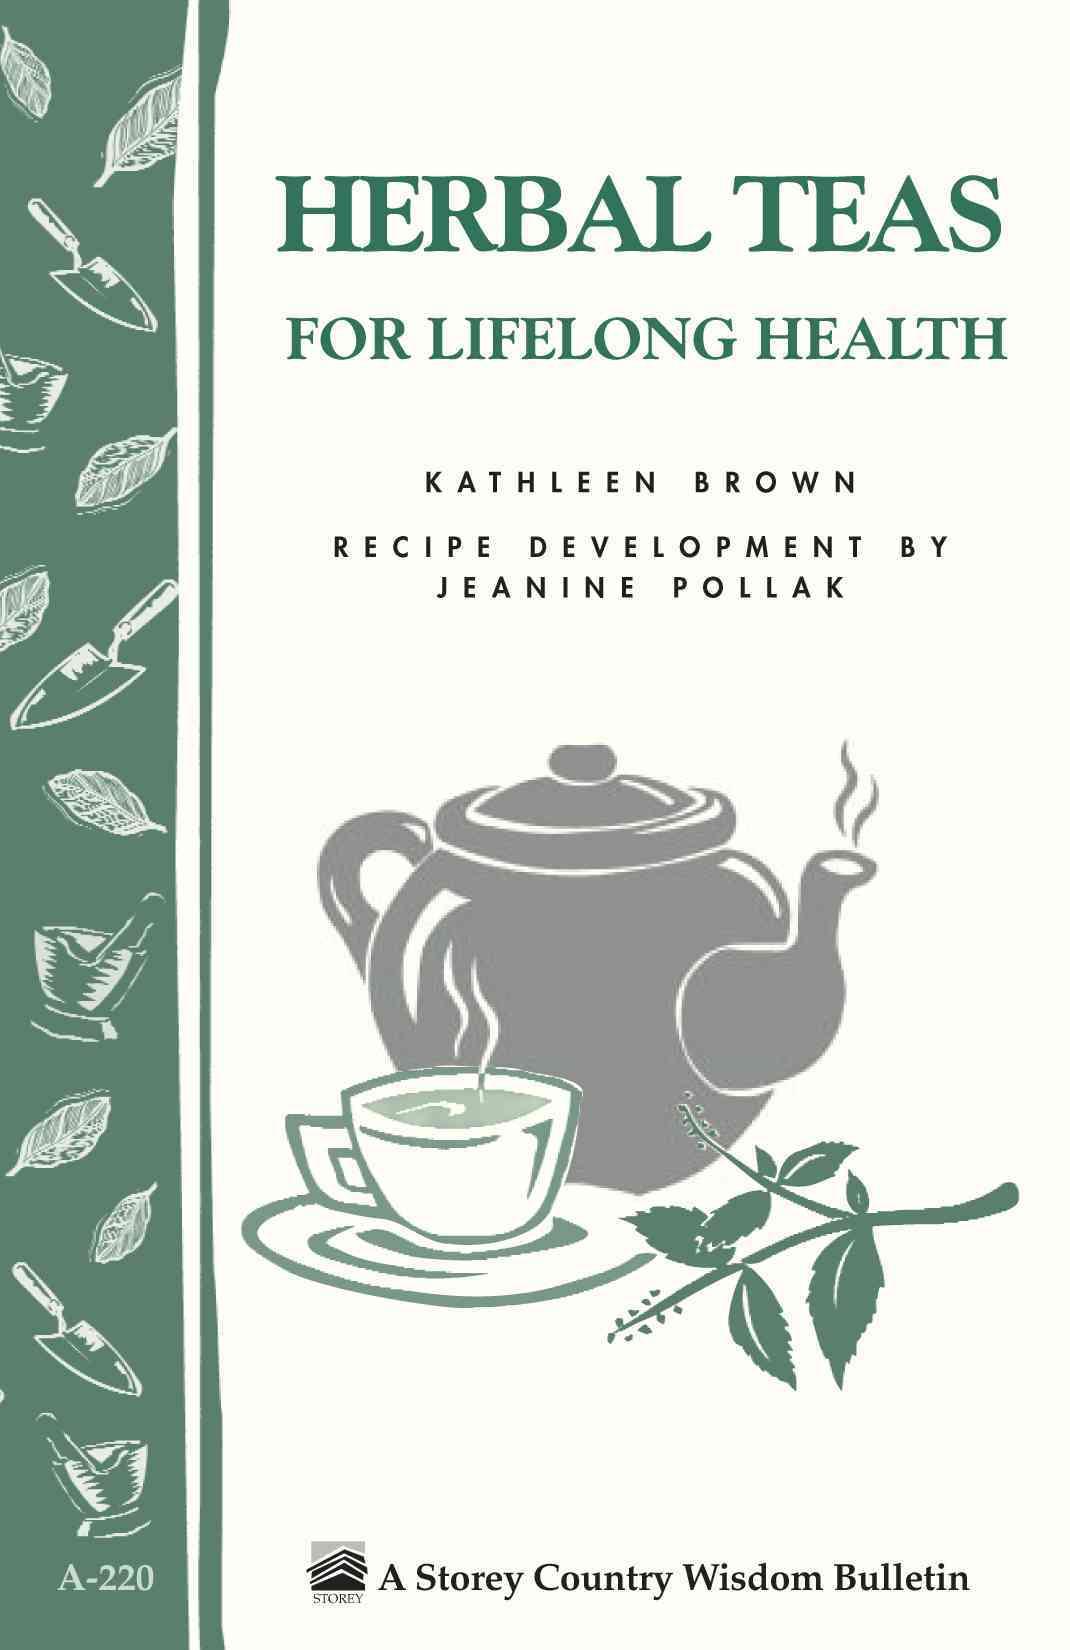 Herbal Teas for Lifelong Health (Paperback)